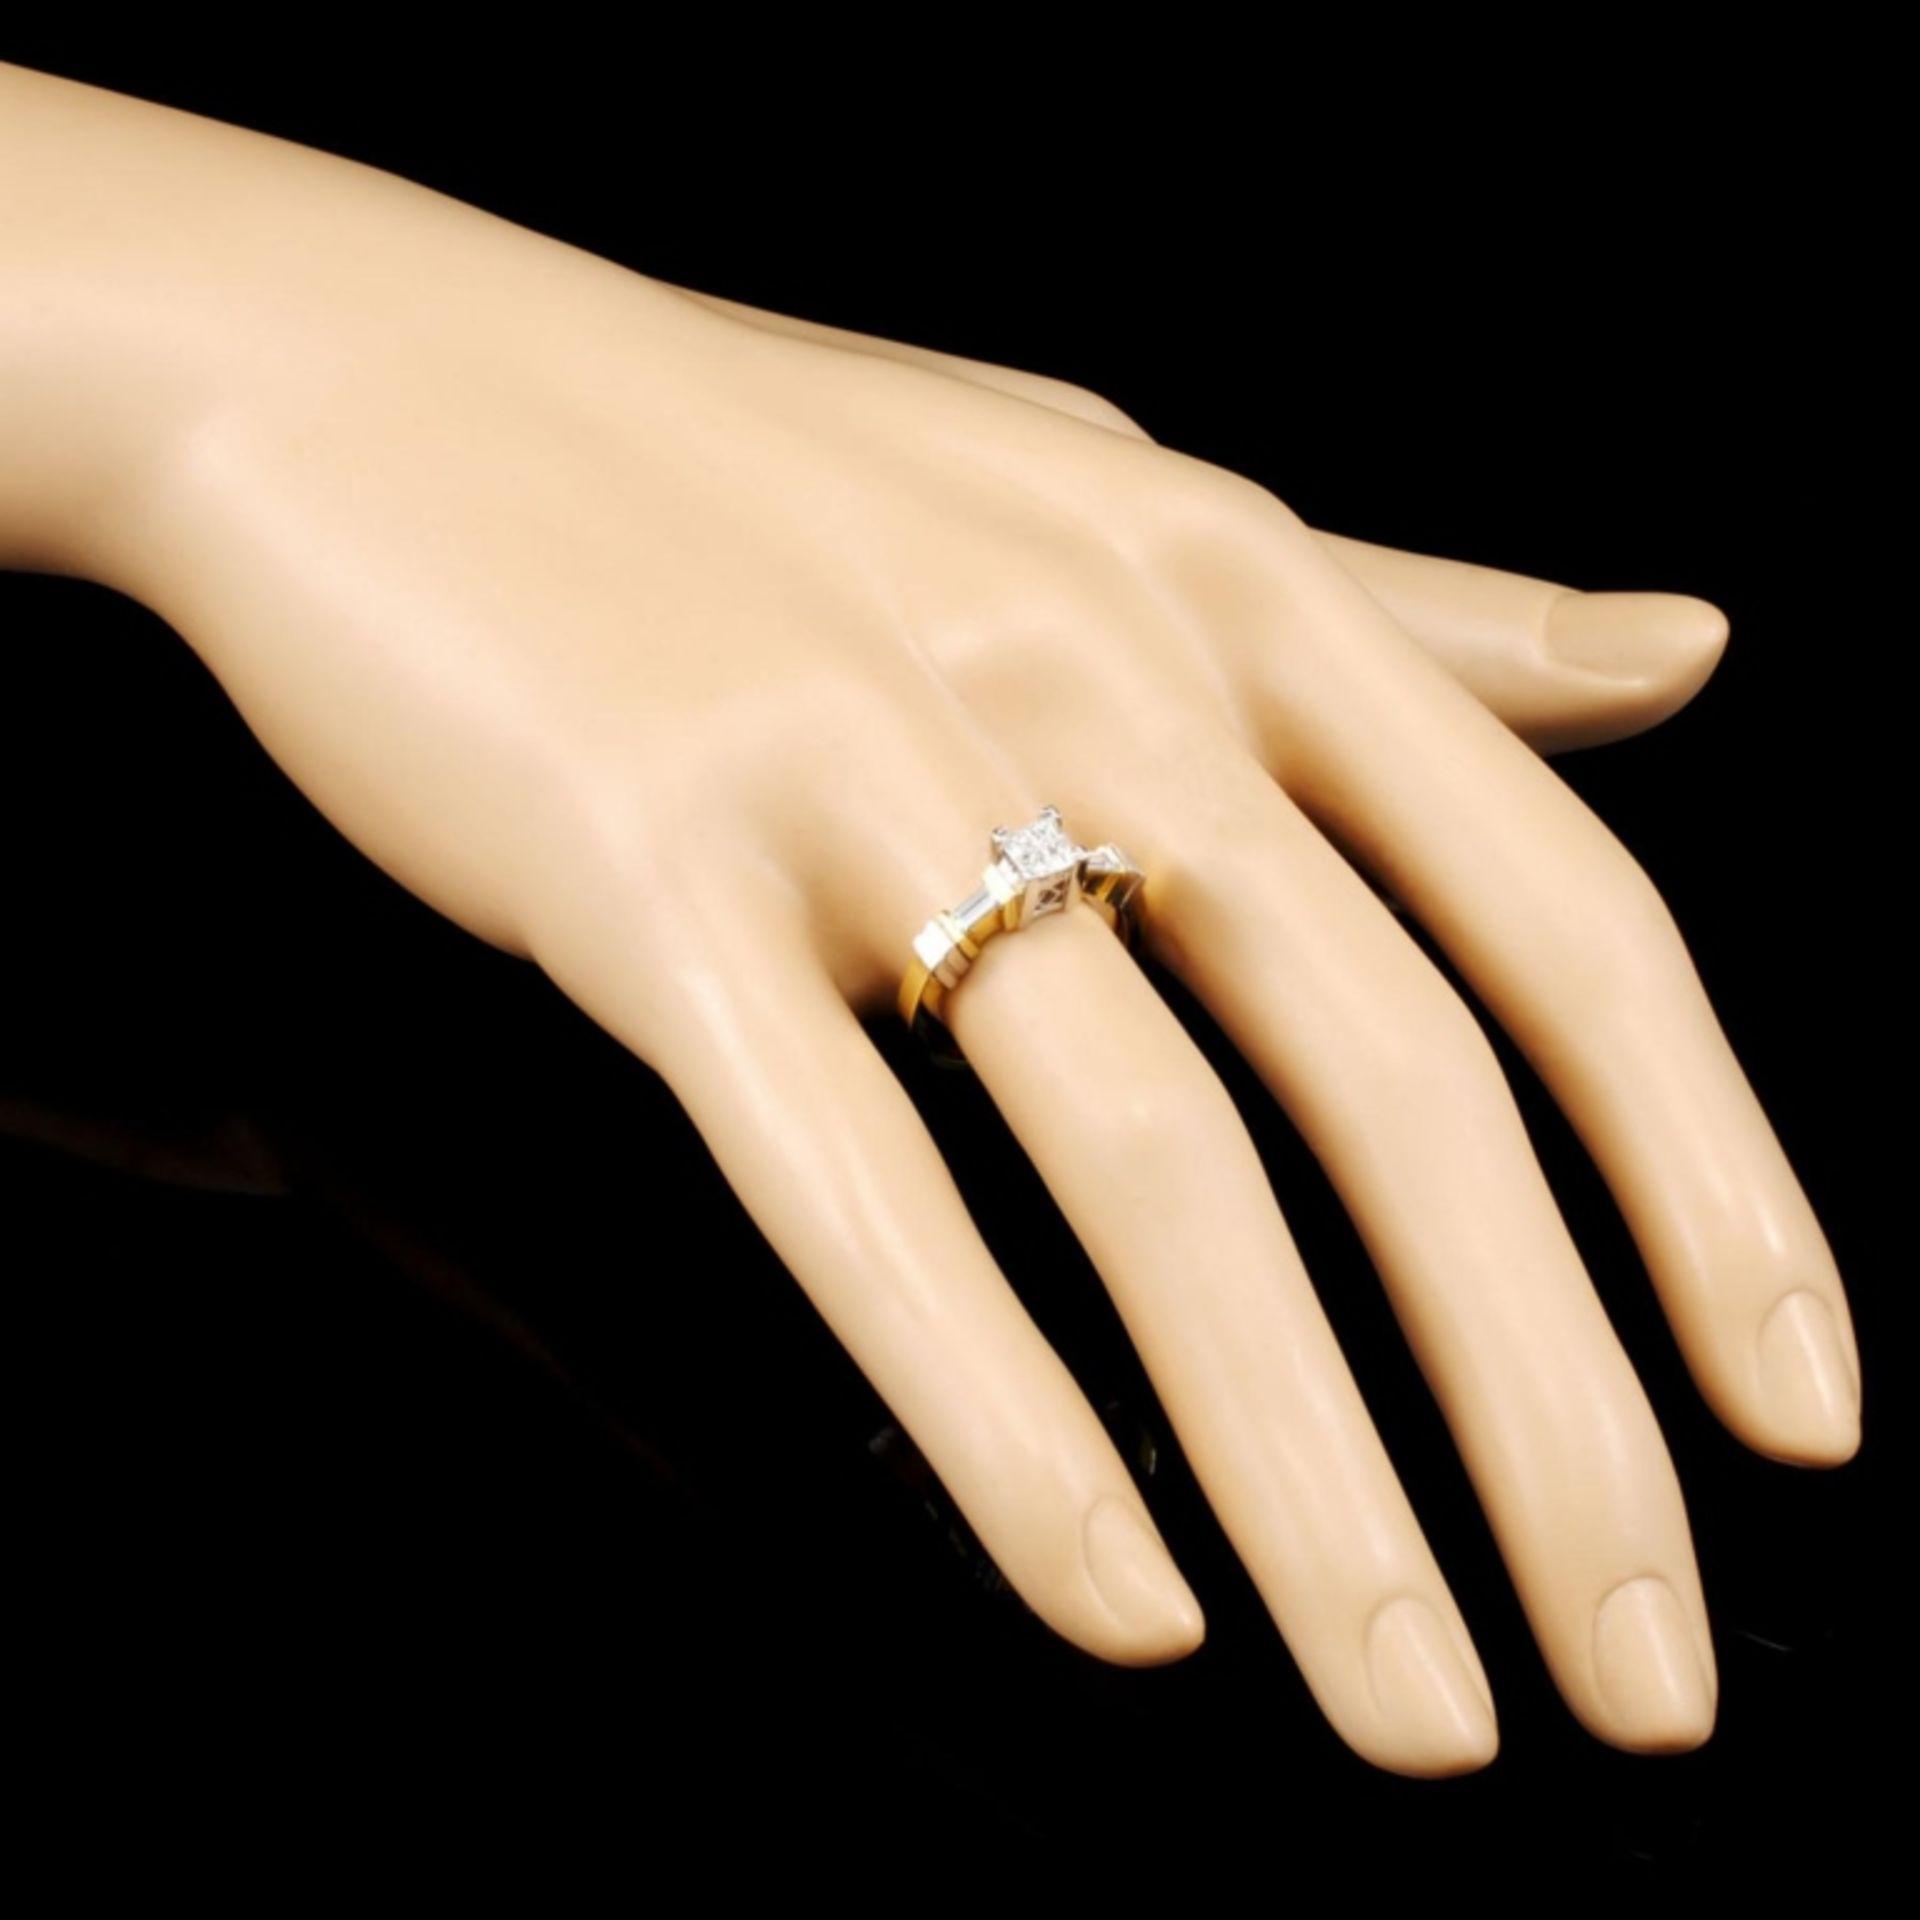 18K Gold 0.50ctw Diamond Ring - Image 3 of 4